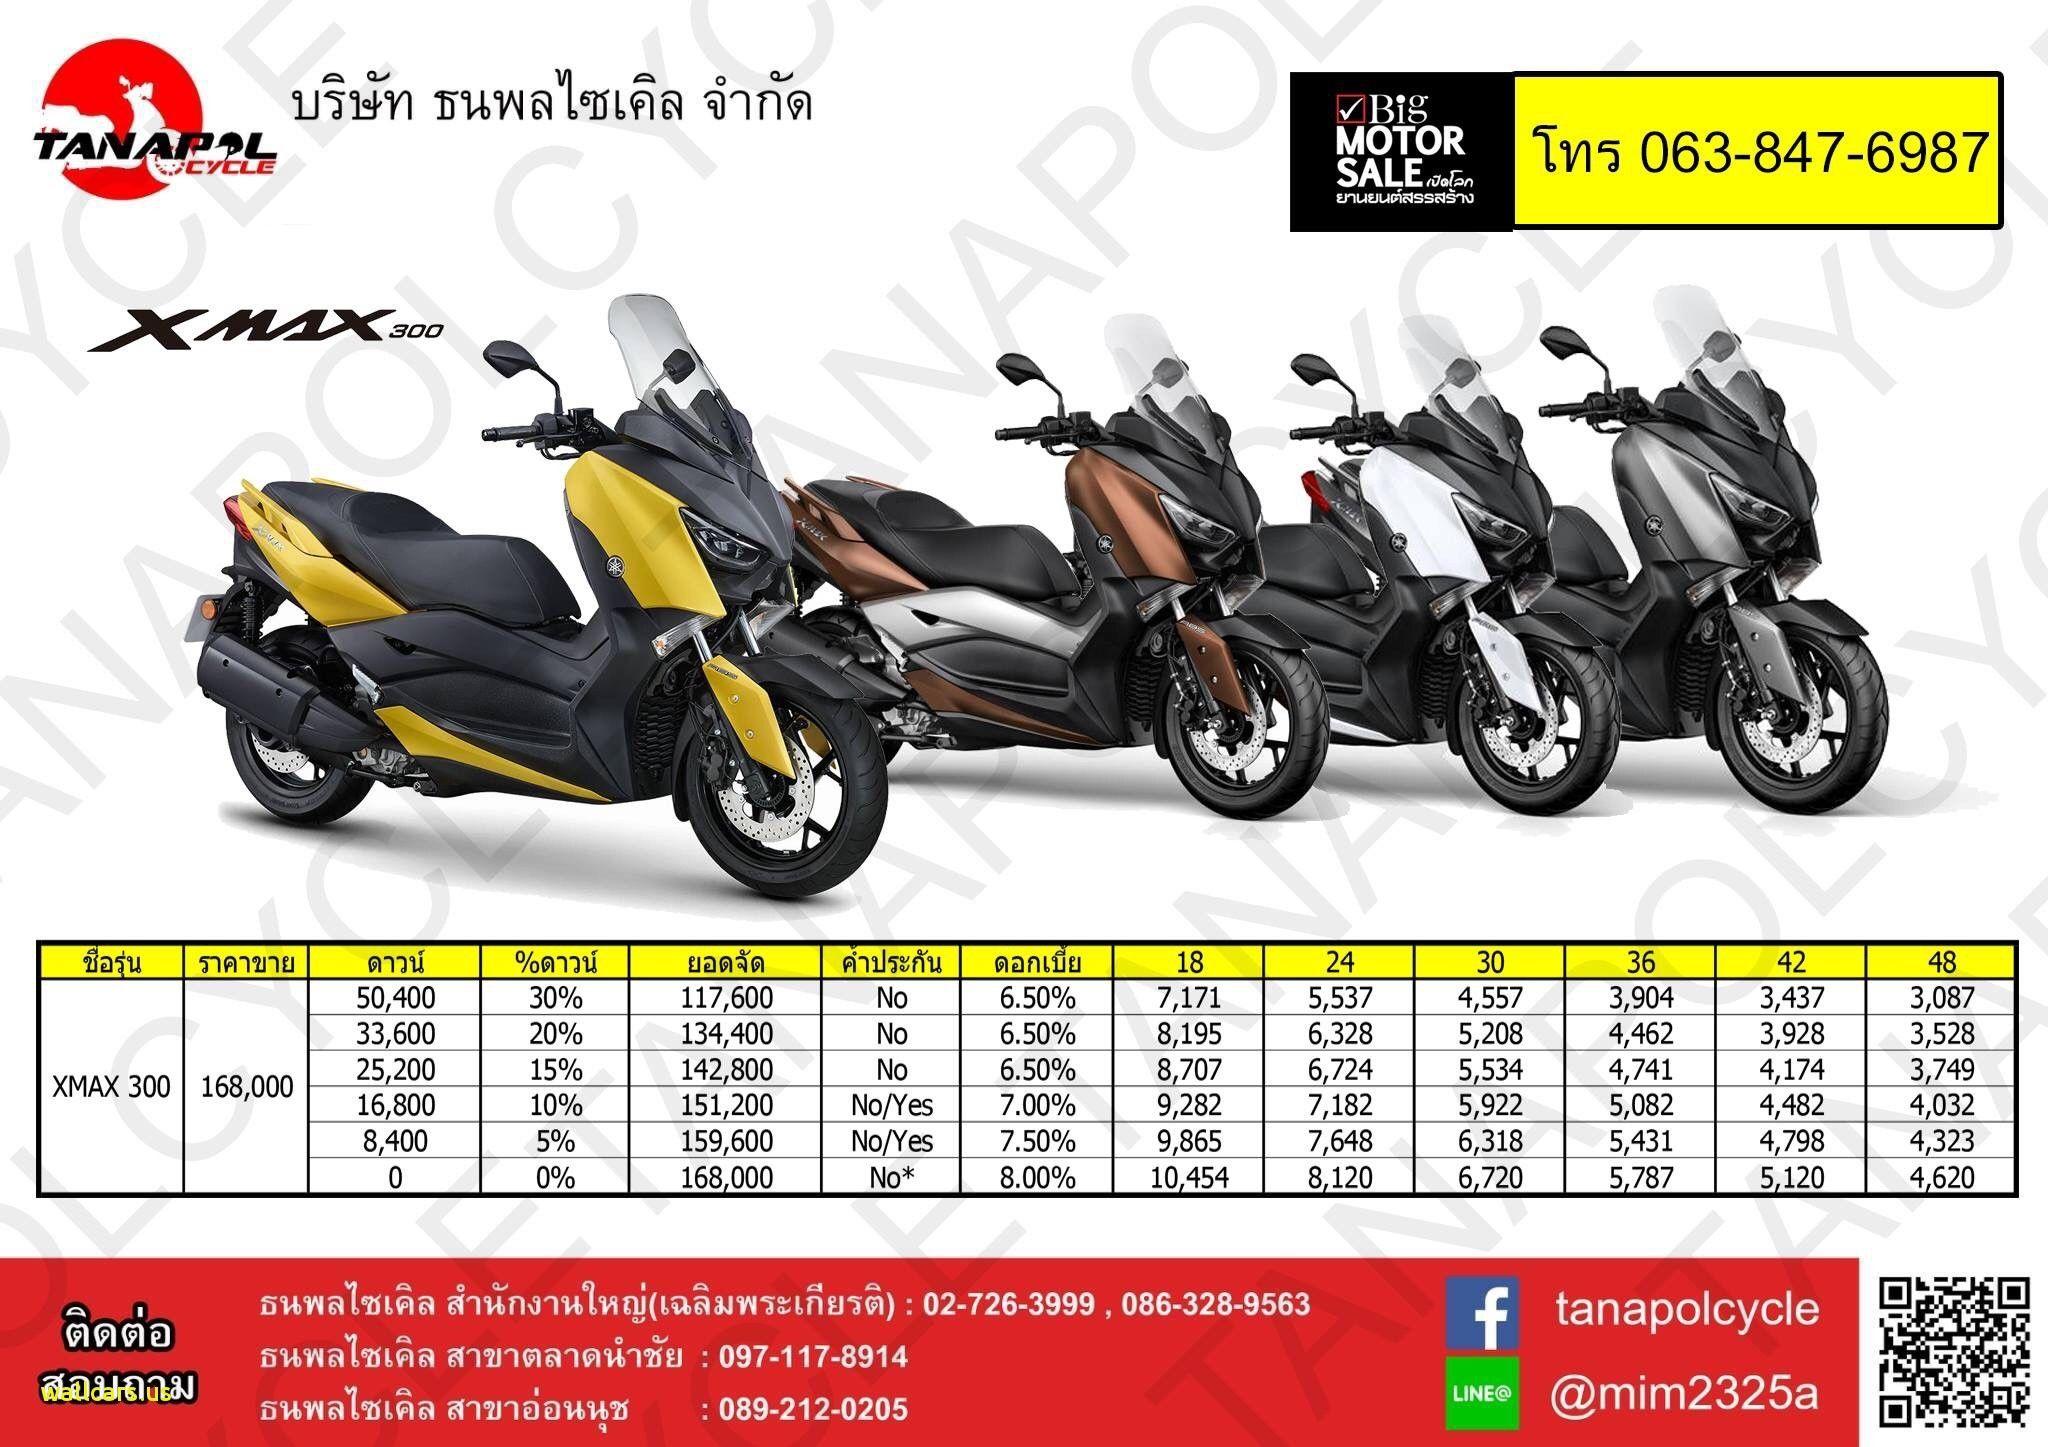 Elegant Honda forza Vs Xmax 300   Elegant Honda forza Vs Xmax 300